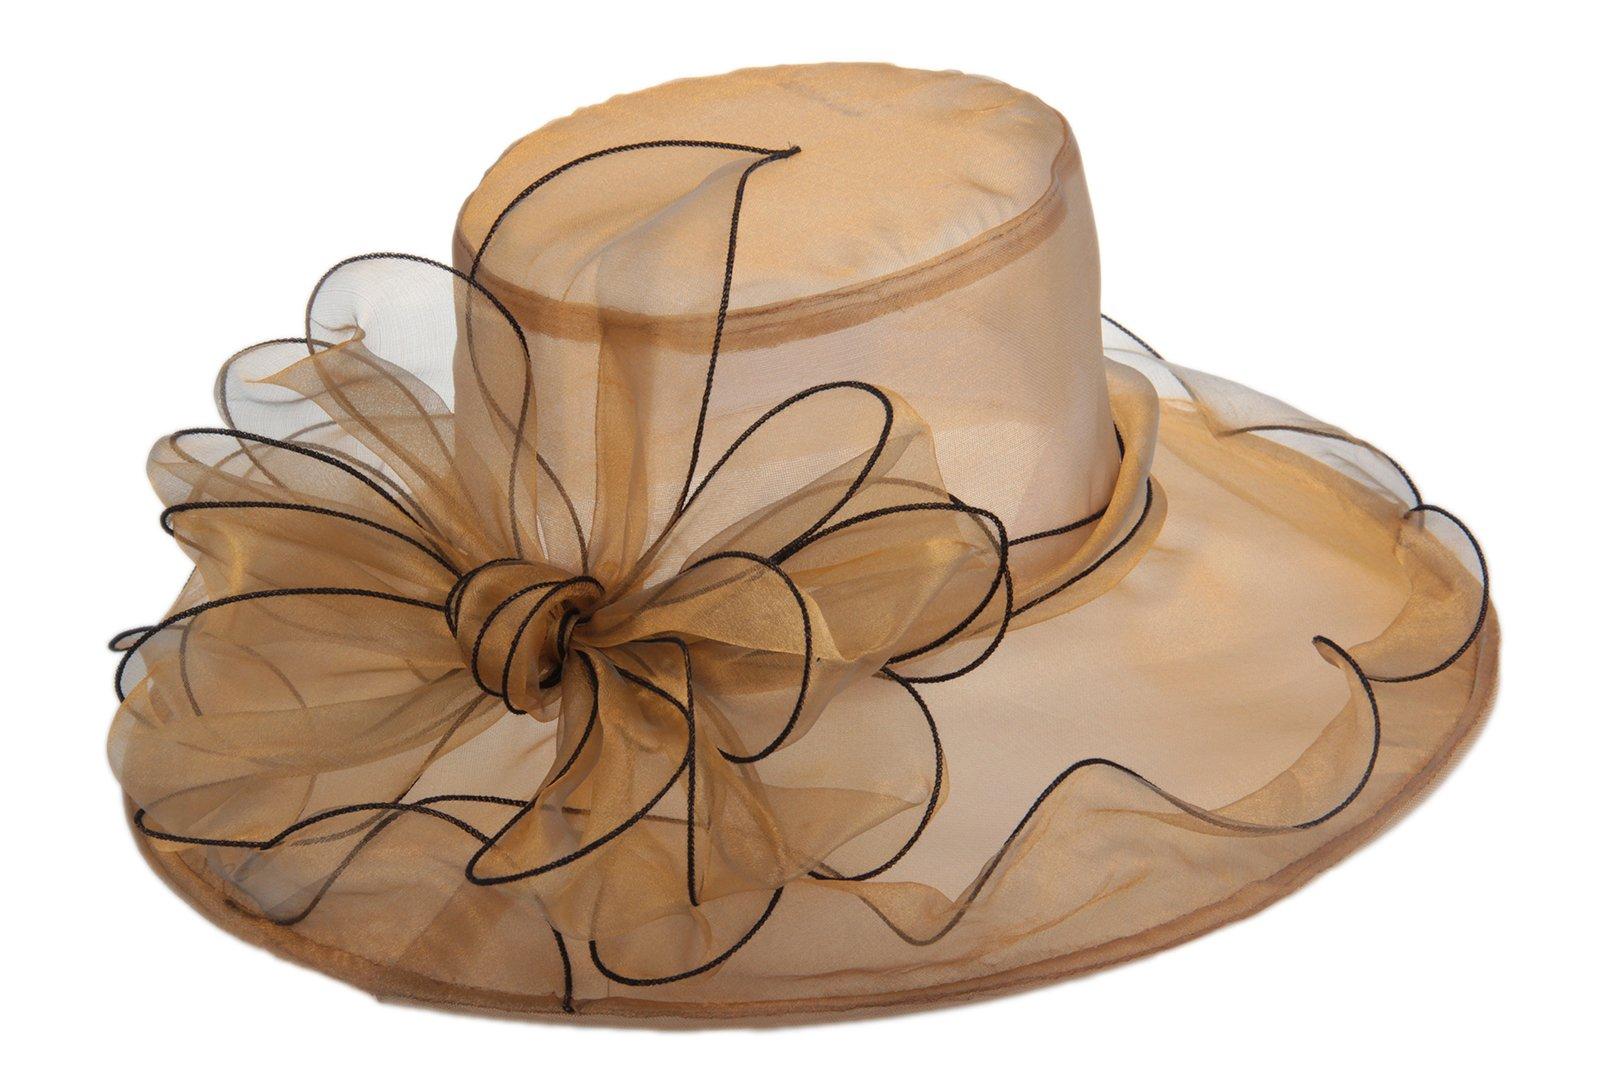 Dantiya Women's Organza Church Kentucky Derby Big Bowknot Fascinator Bridal Cap British (Gold) by Dantiya (Image #3)